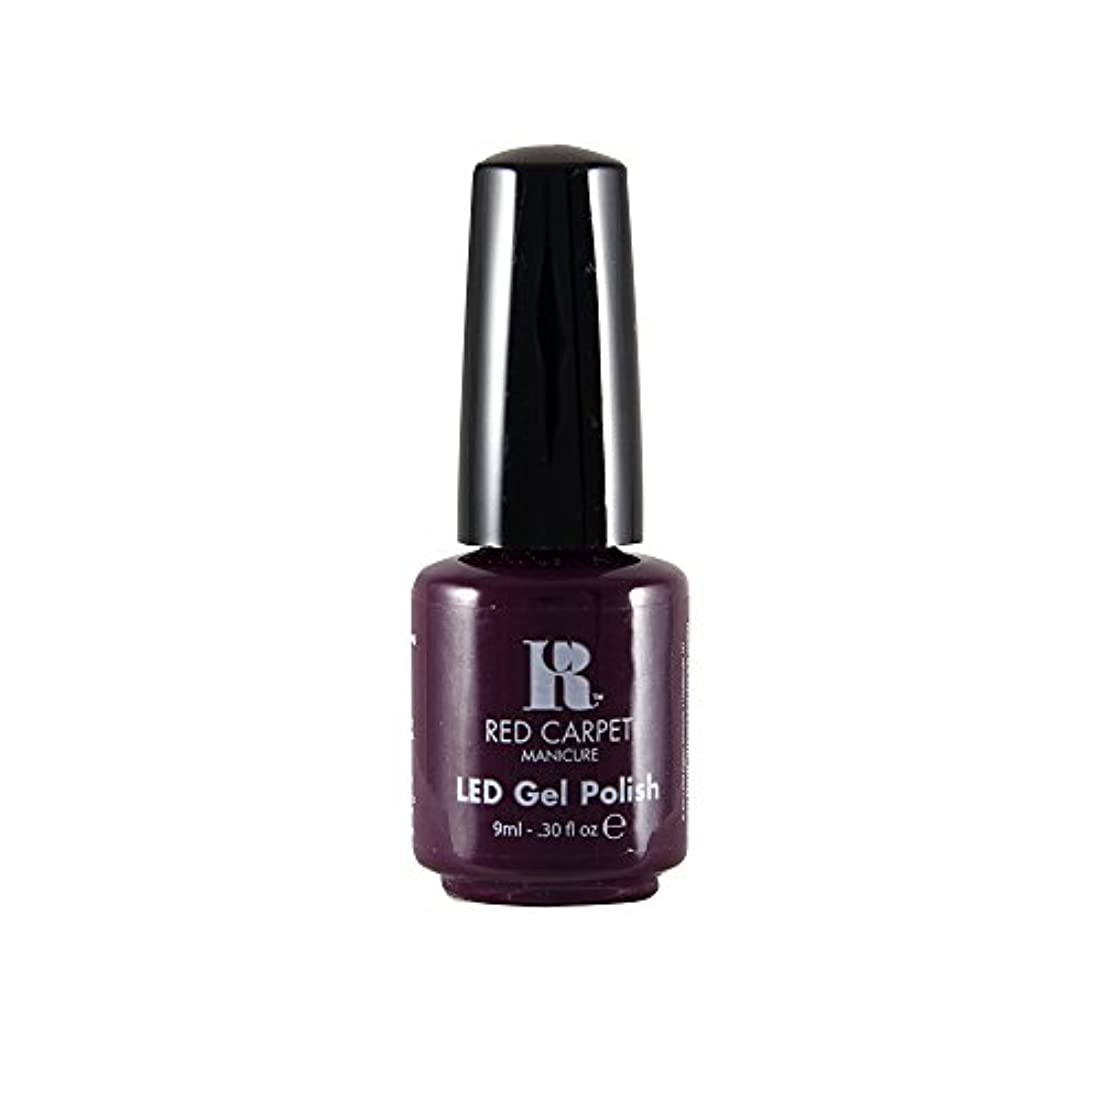 Red Carpet Manicure - LED Nail Gel Polish - Thank You, Thank You - 0.3oz / 9ml